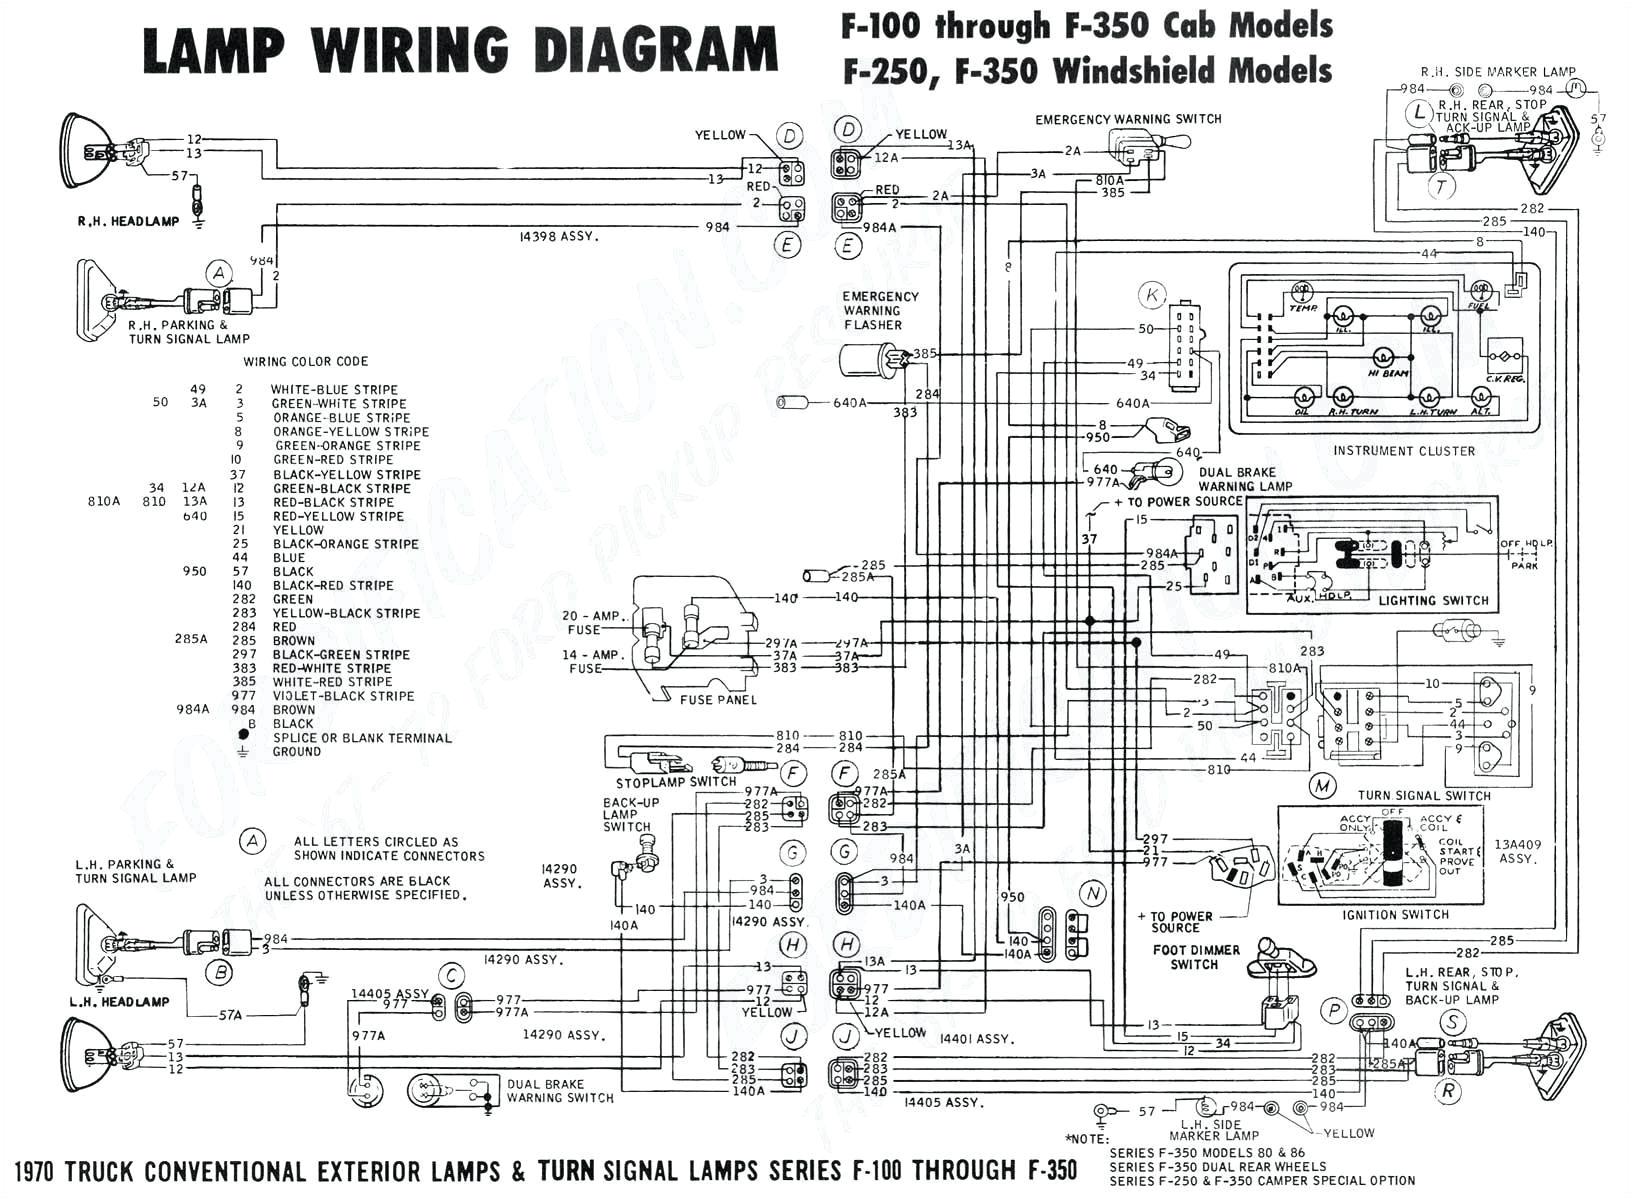 Harley Davidson Voltage Regulator Wiring Diagram Wiring Diagram Of toyota Tamaraw Fx Search Wiring Diagram